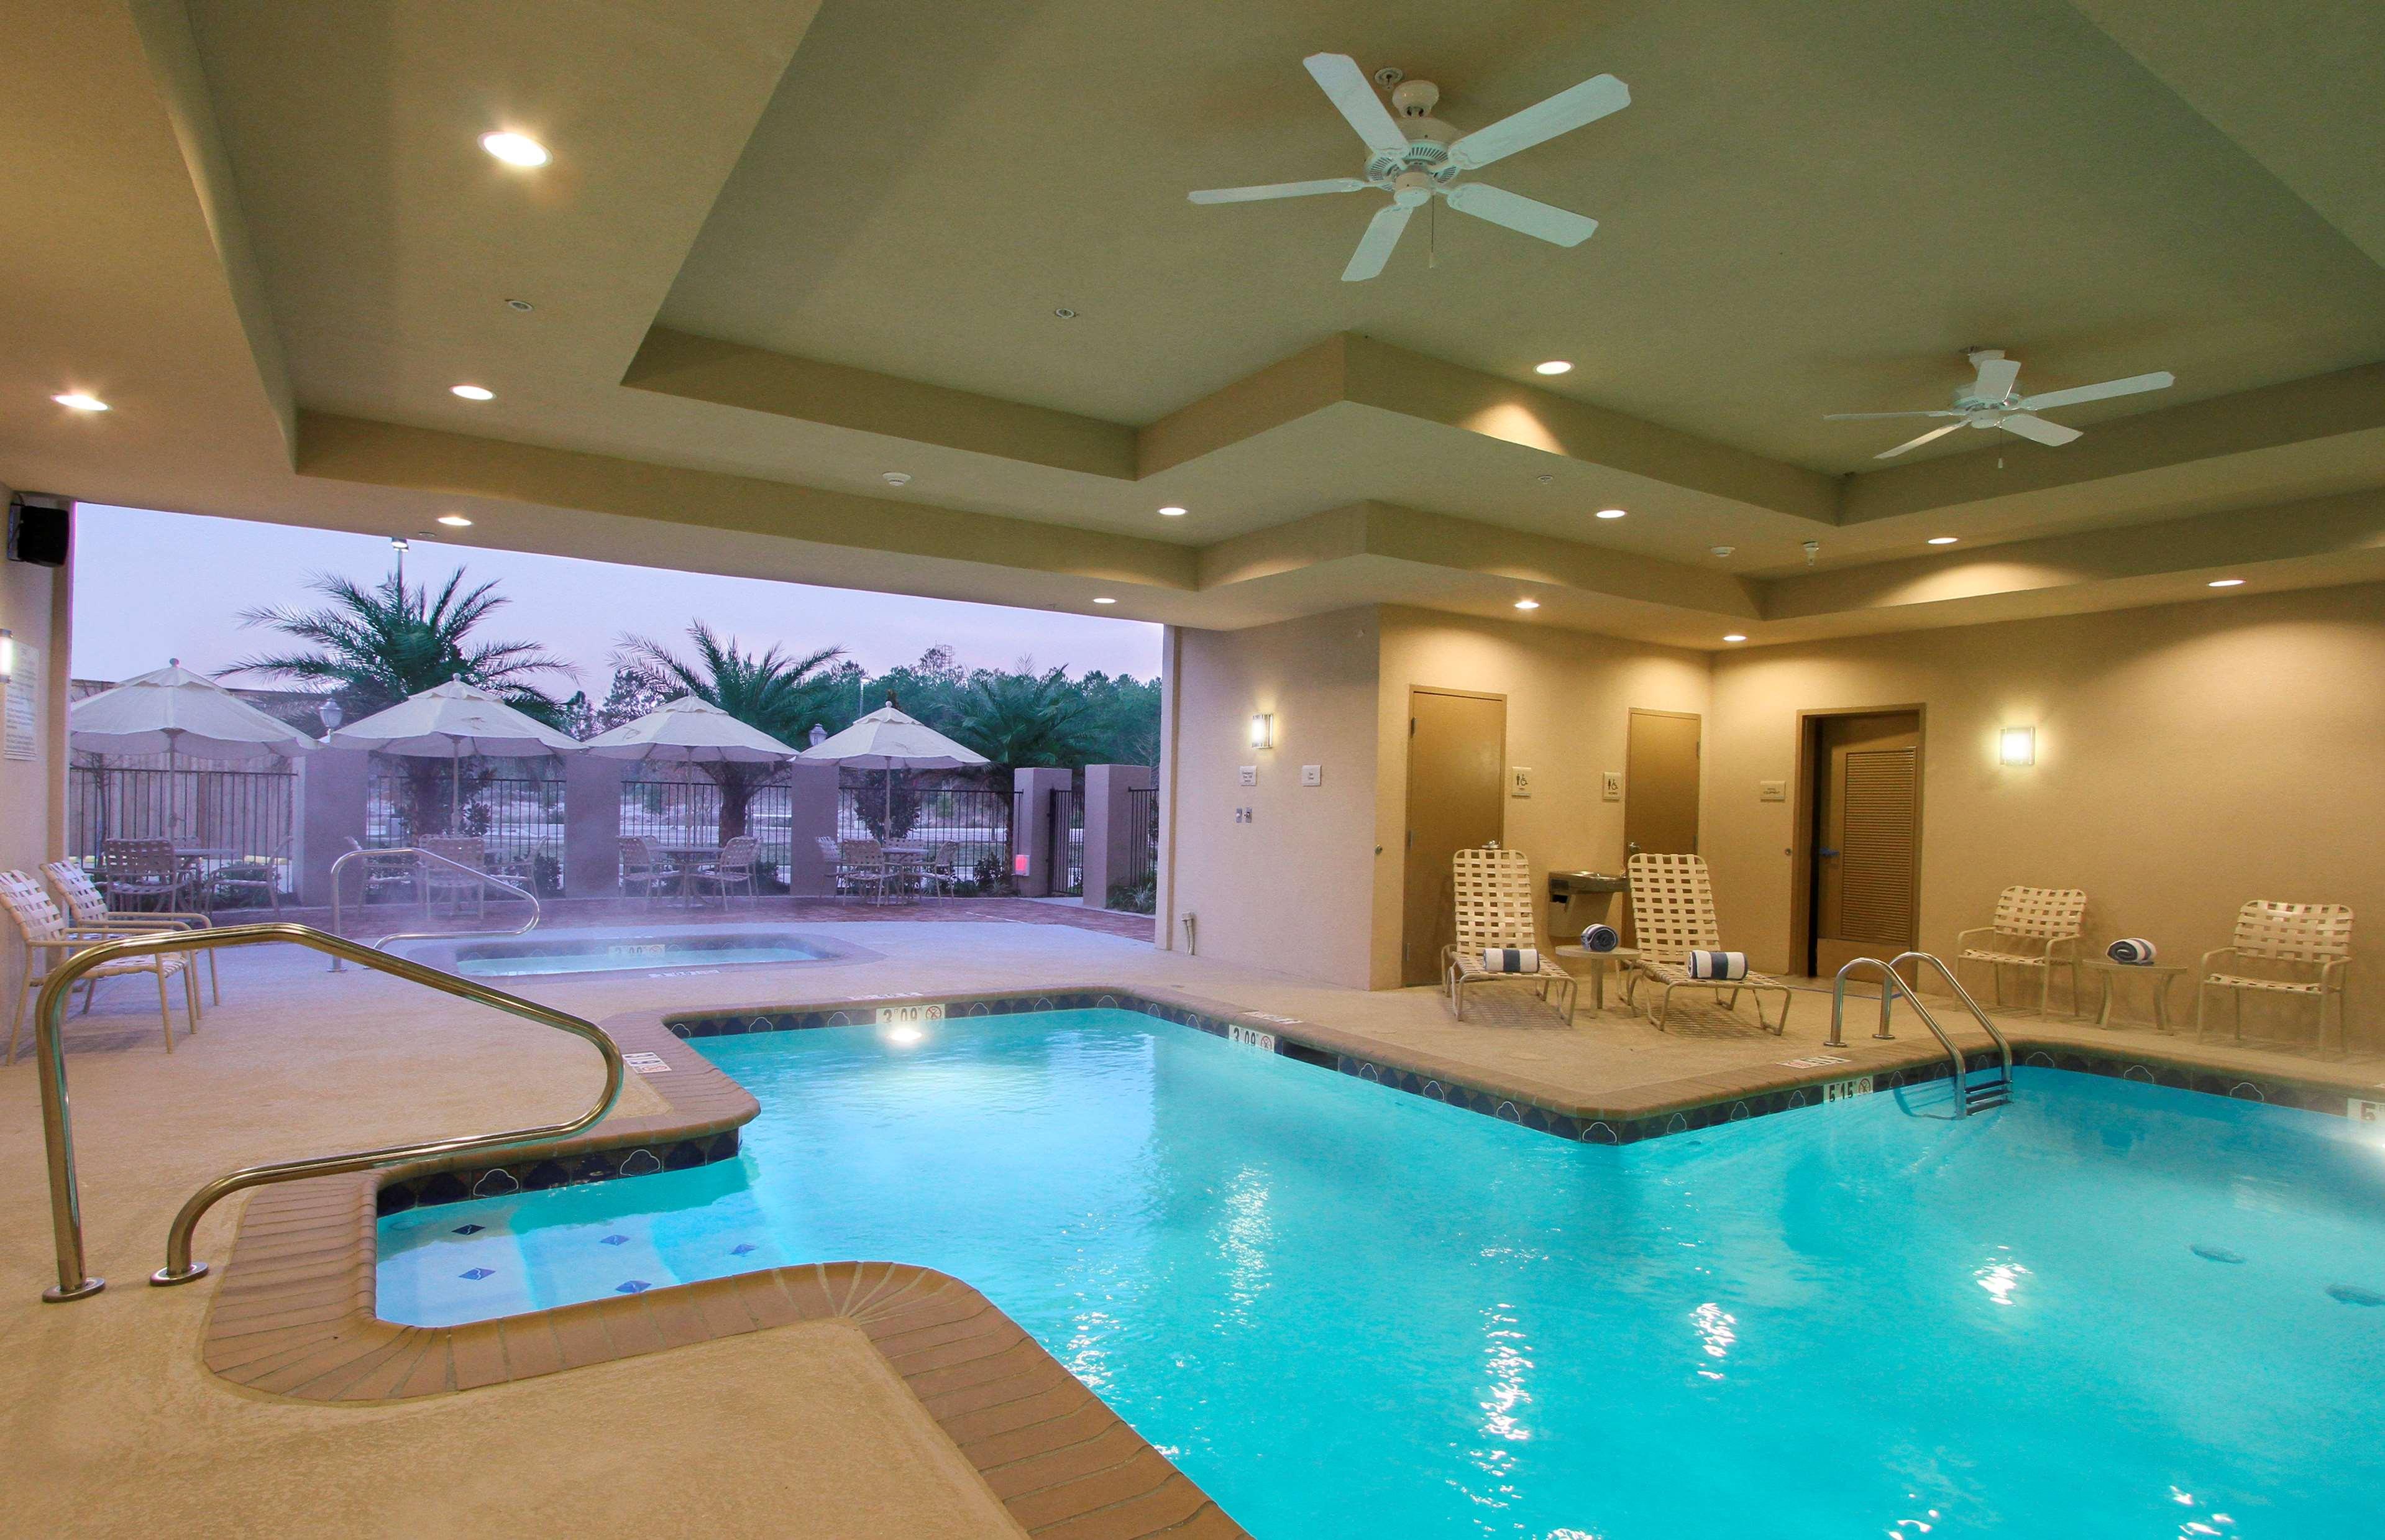 Hilton Garden Inn Covington/Mandeville image 7